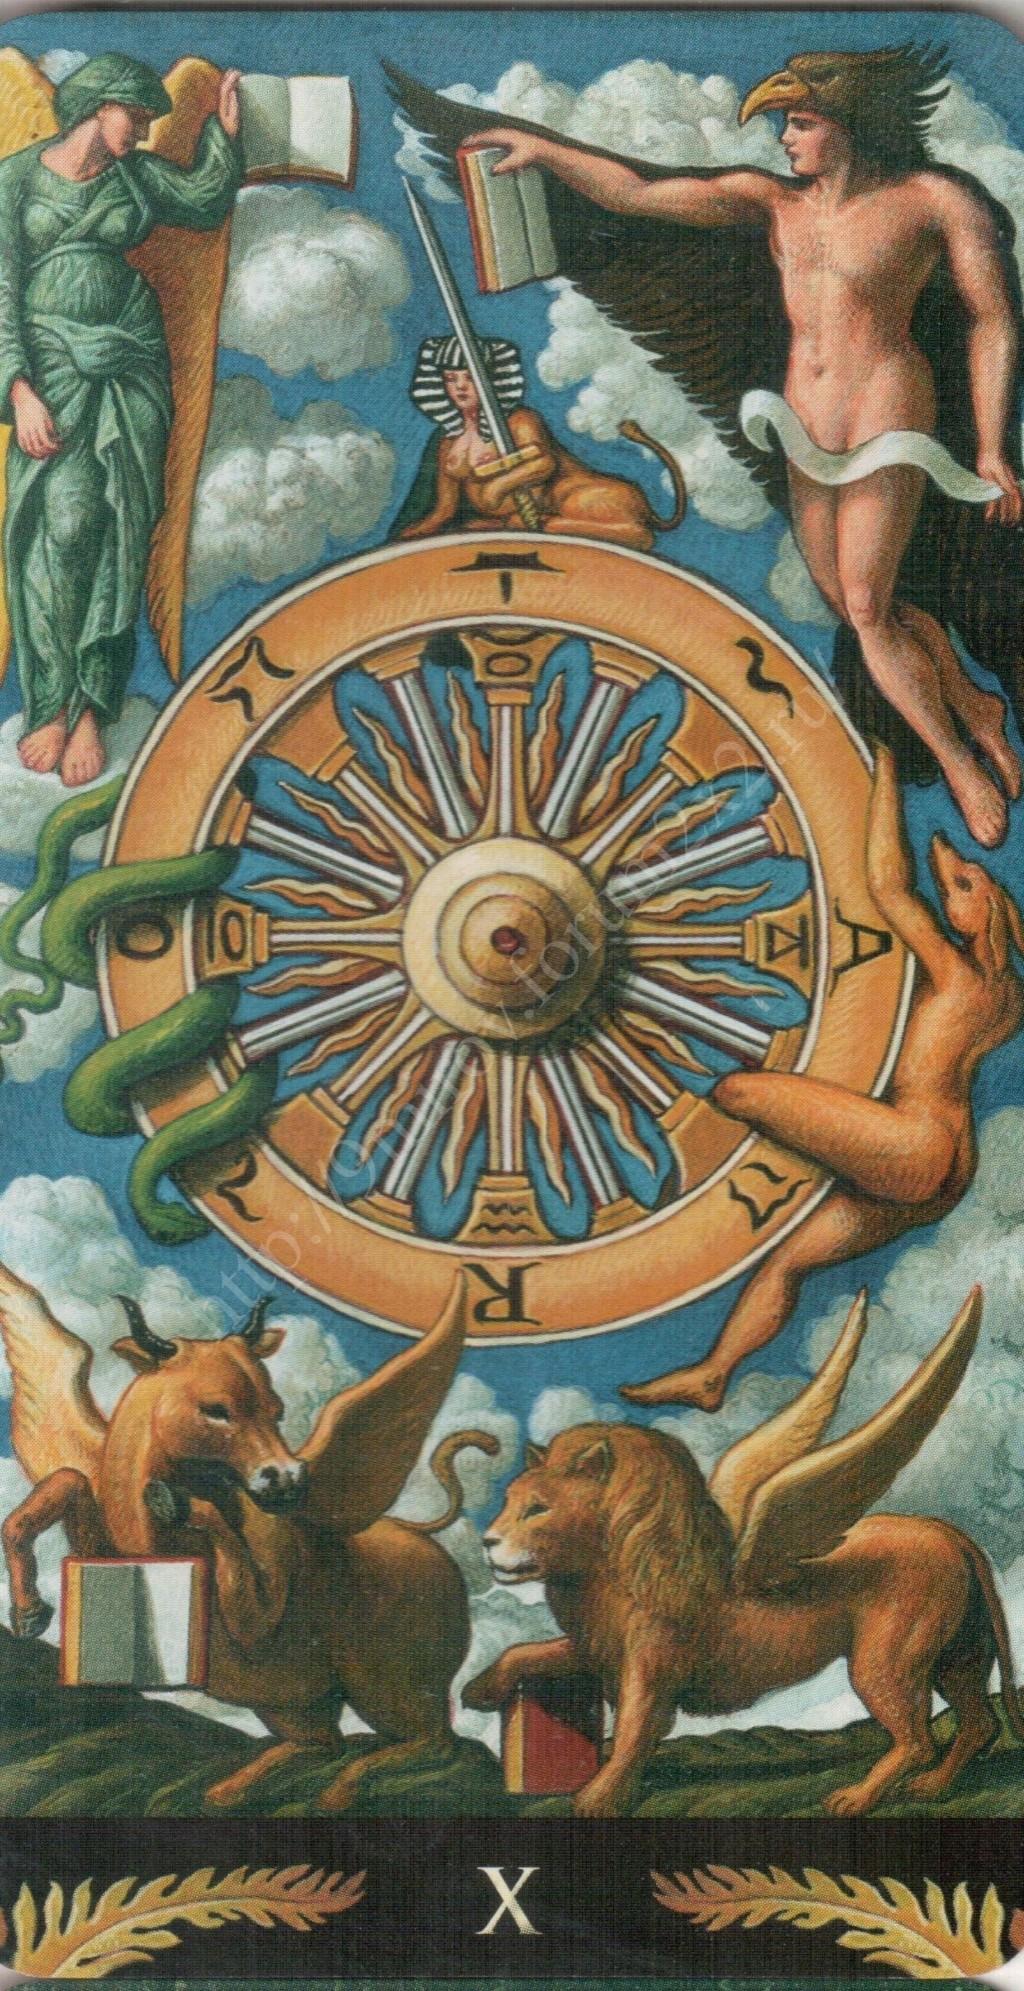 Таро Прерафаэлитов (Pre-Raphaelite Tarot) Галерея Water373